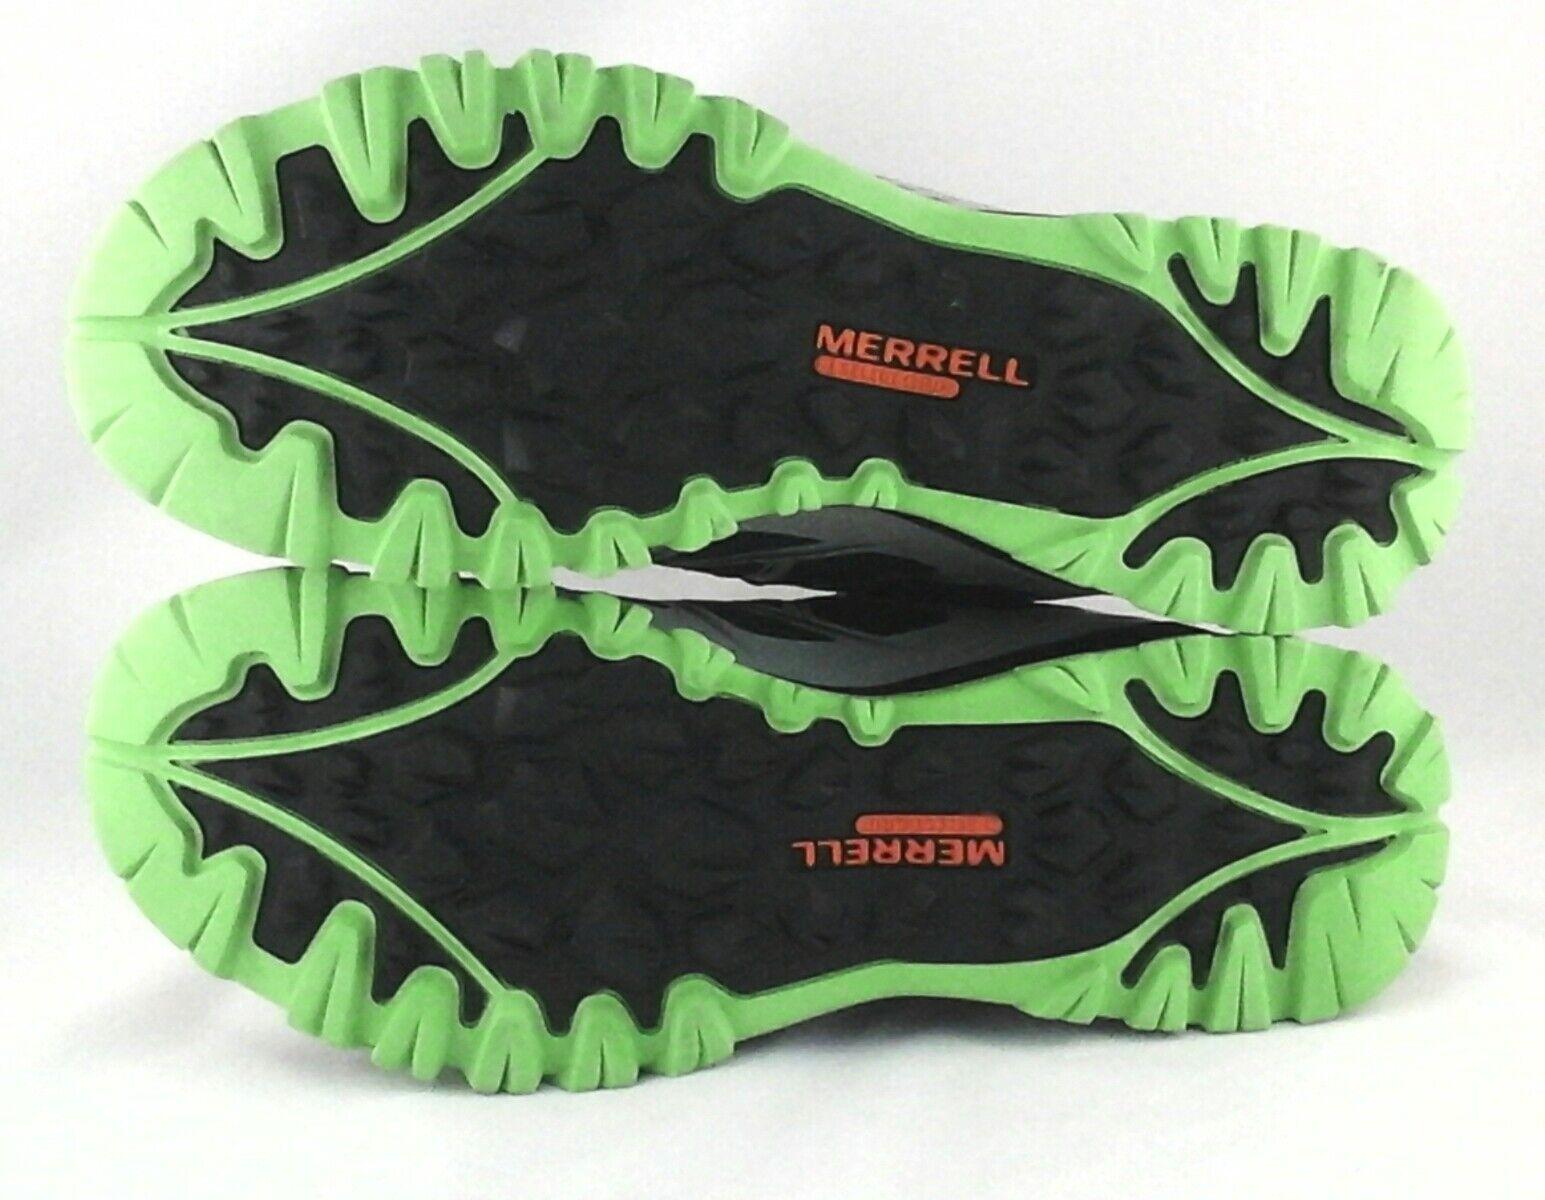 MERRELL Hiking Shoes CAPRA BOLT Sneakers Black Silver J35383 Dry Men s  130  New 964ec905f